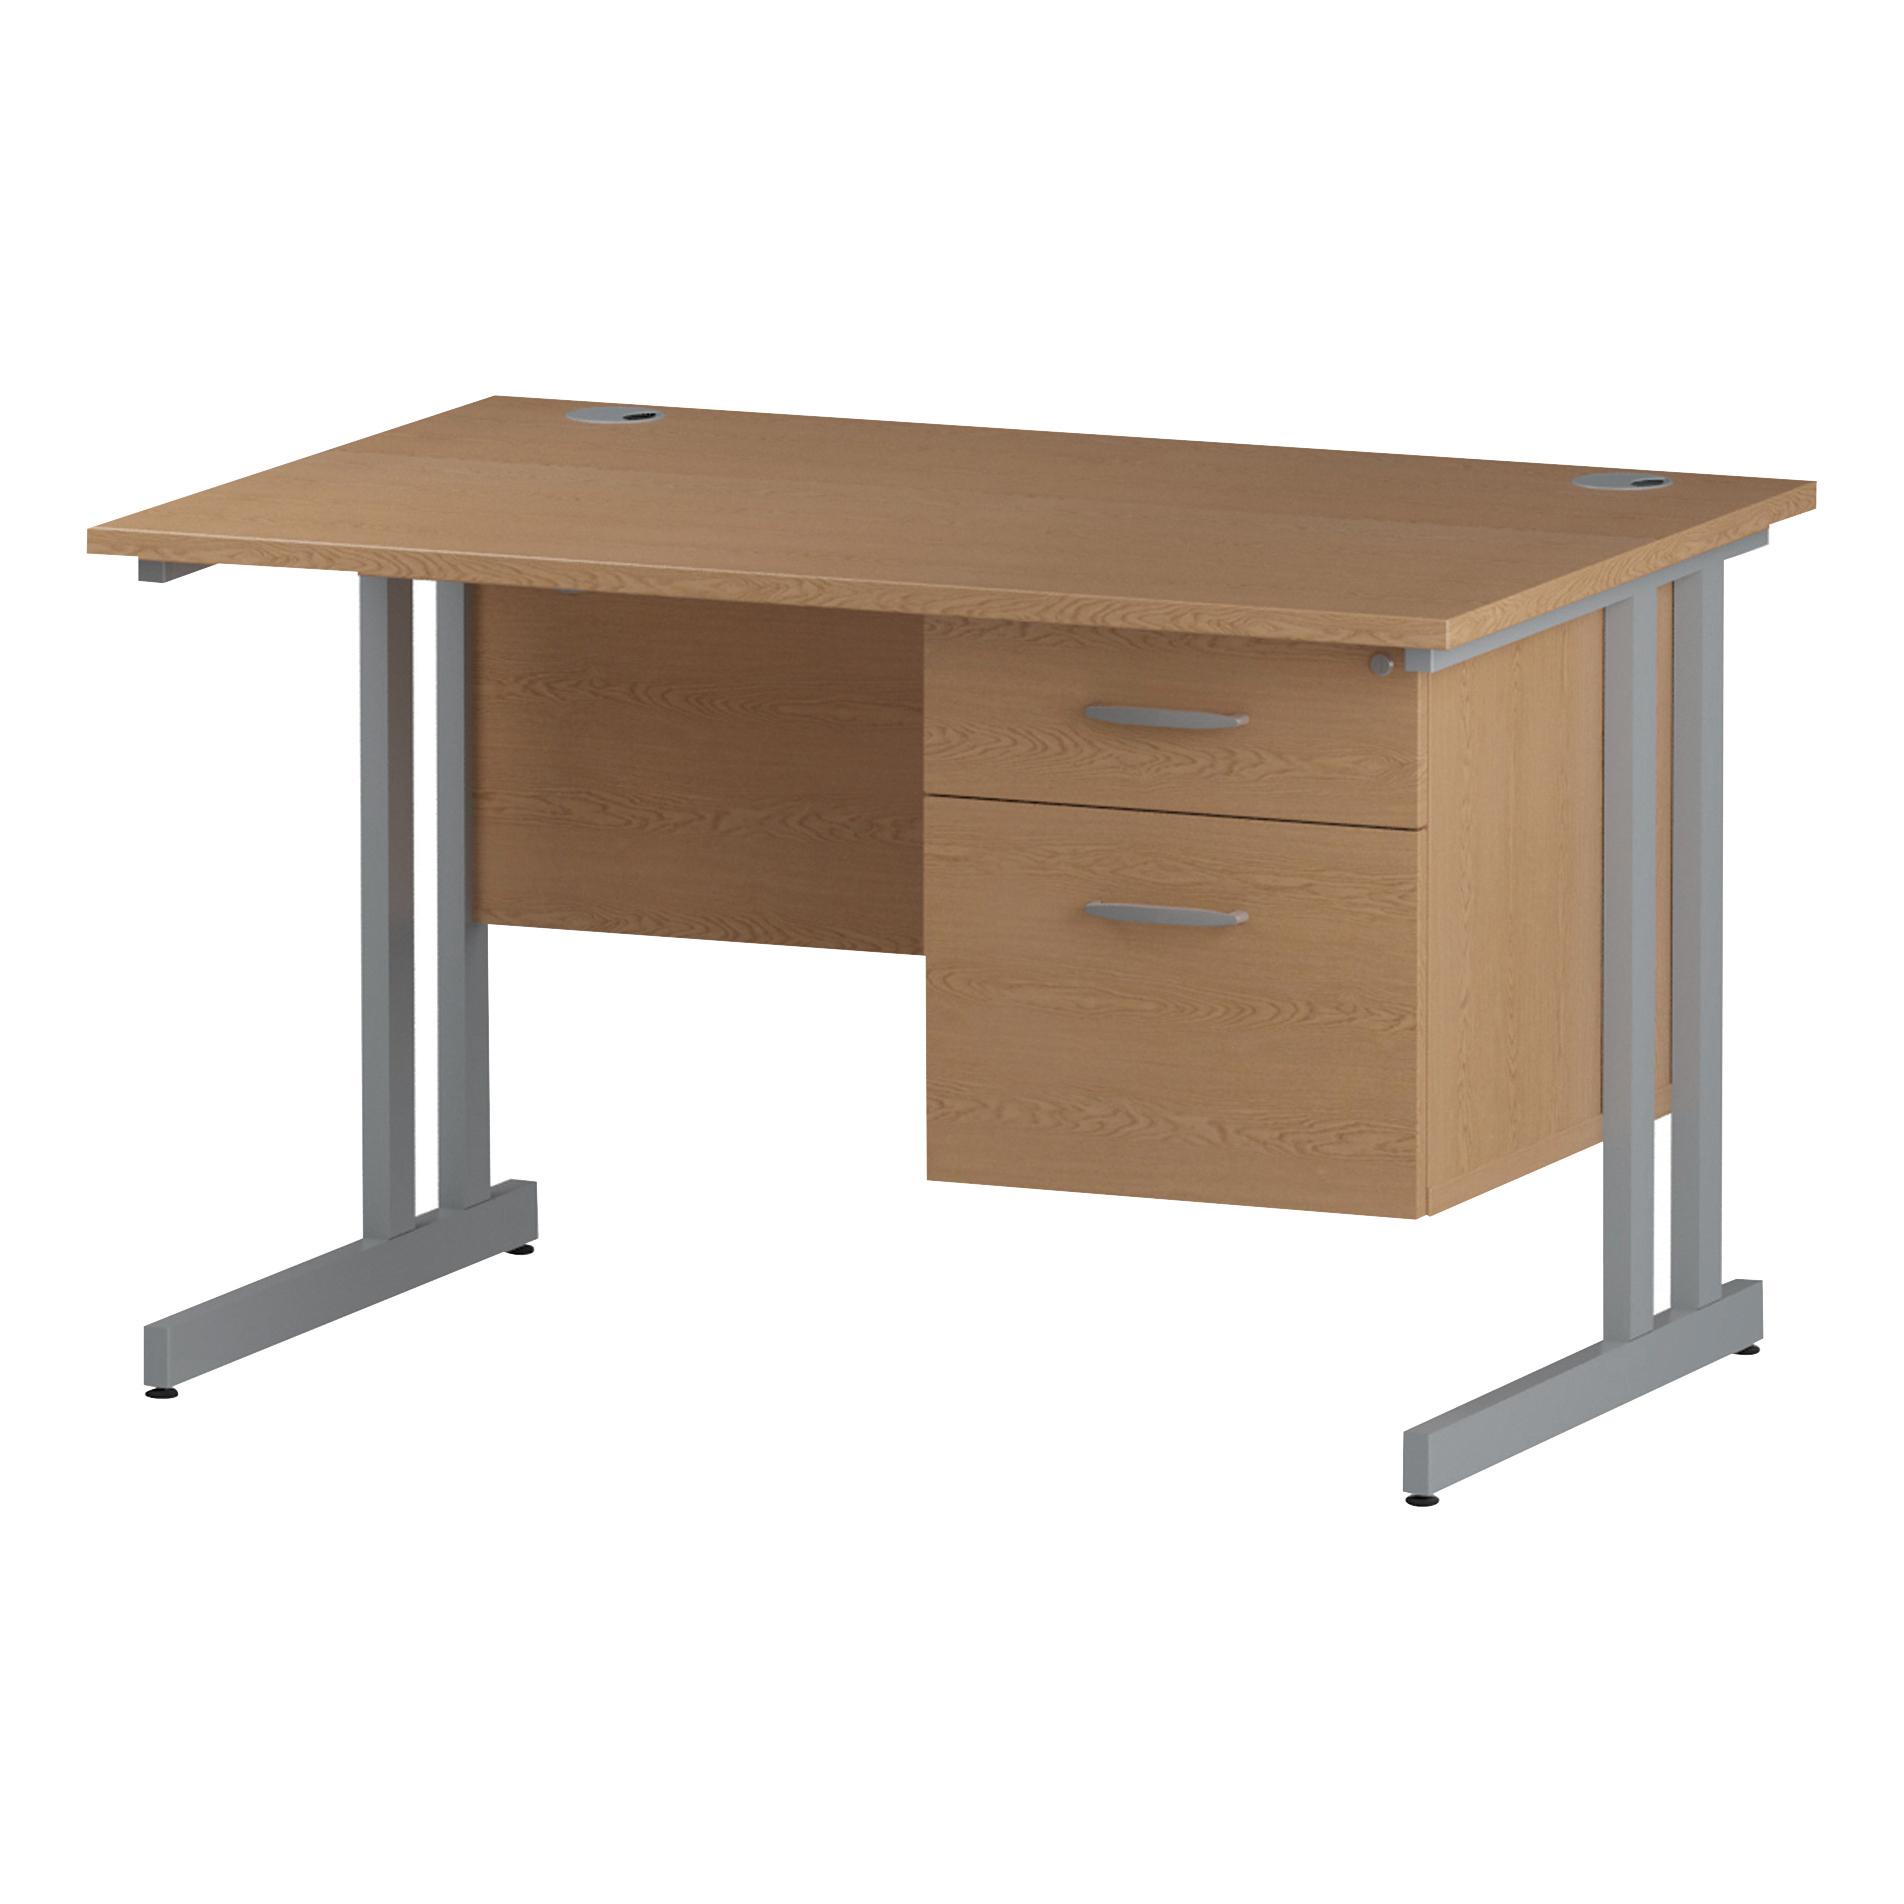 Trexus Rectangular Desk Silver Cantilever Leg 1200x800mm Fixed Pedestal 2 Drawers Oak Ref I002657